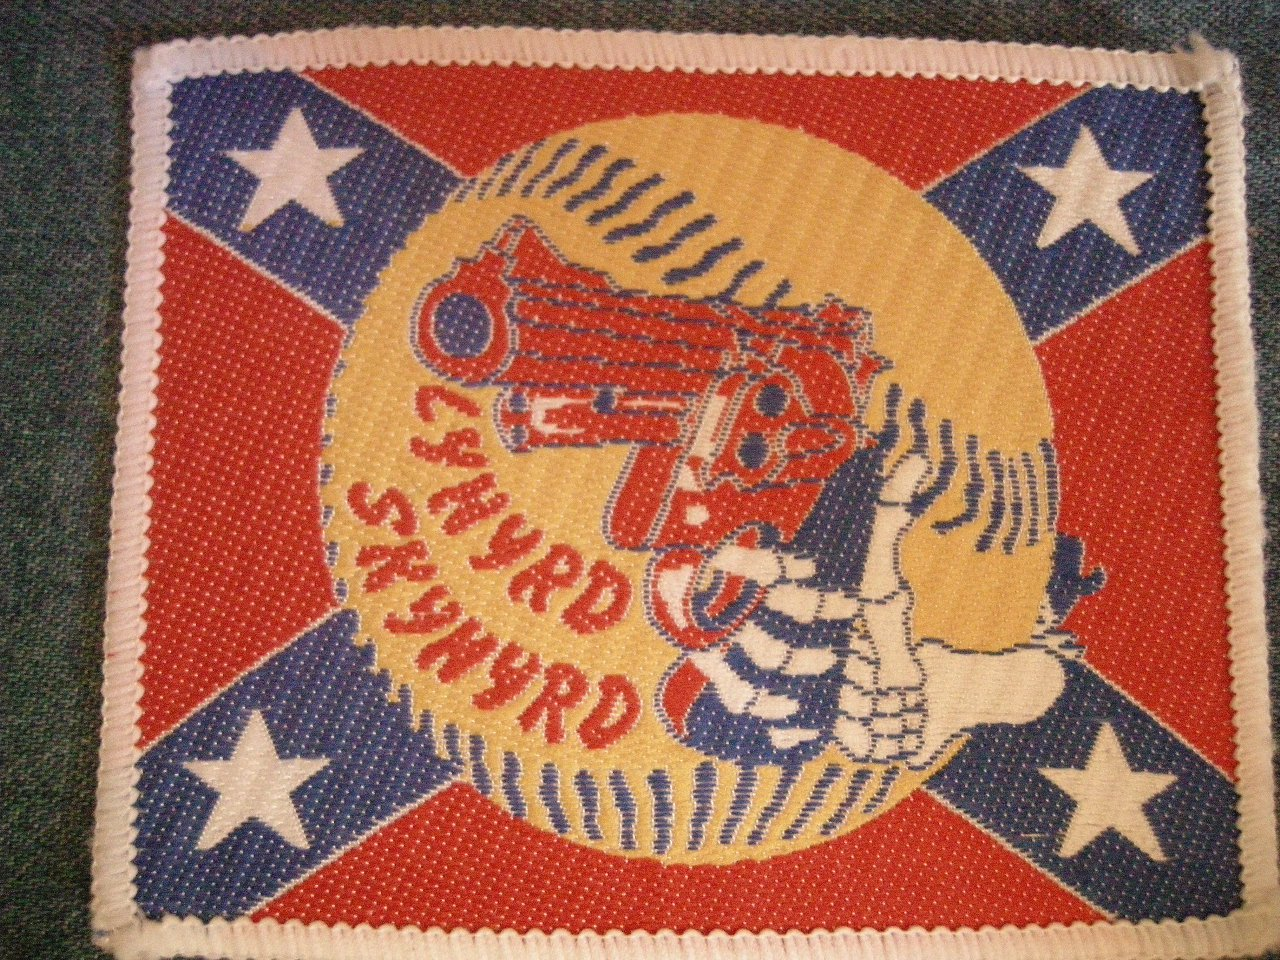 LYNYRD SKYNYRD sew-on PATCH rebel flag gun baseball VINTAGE